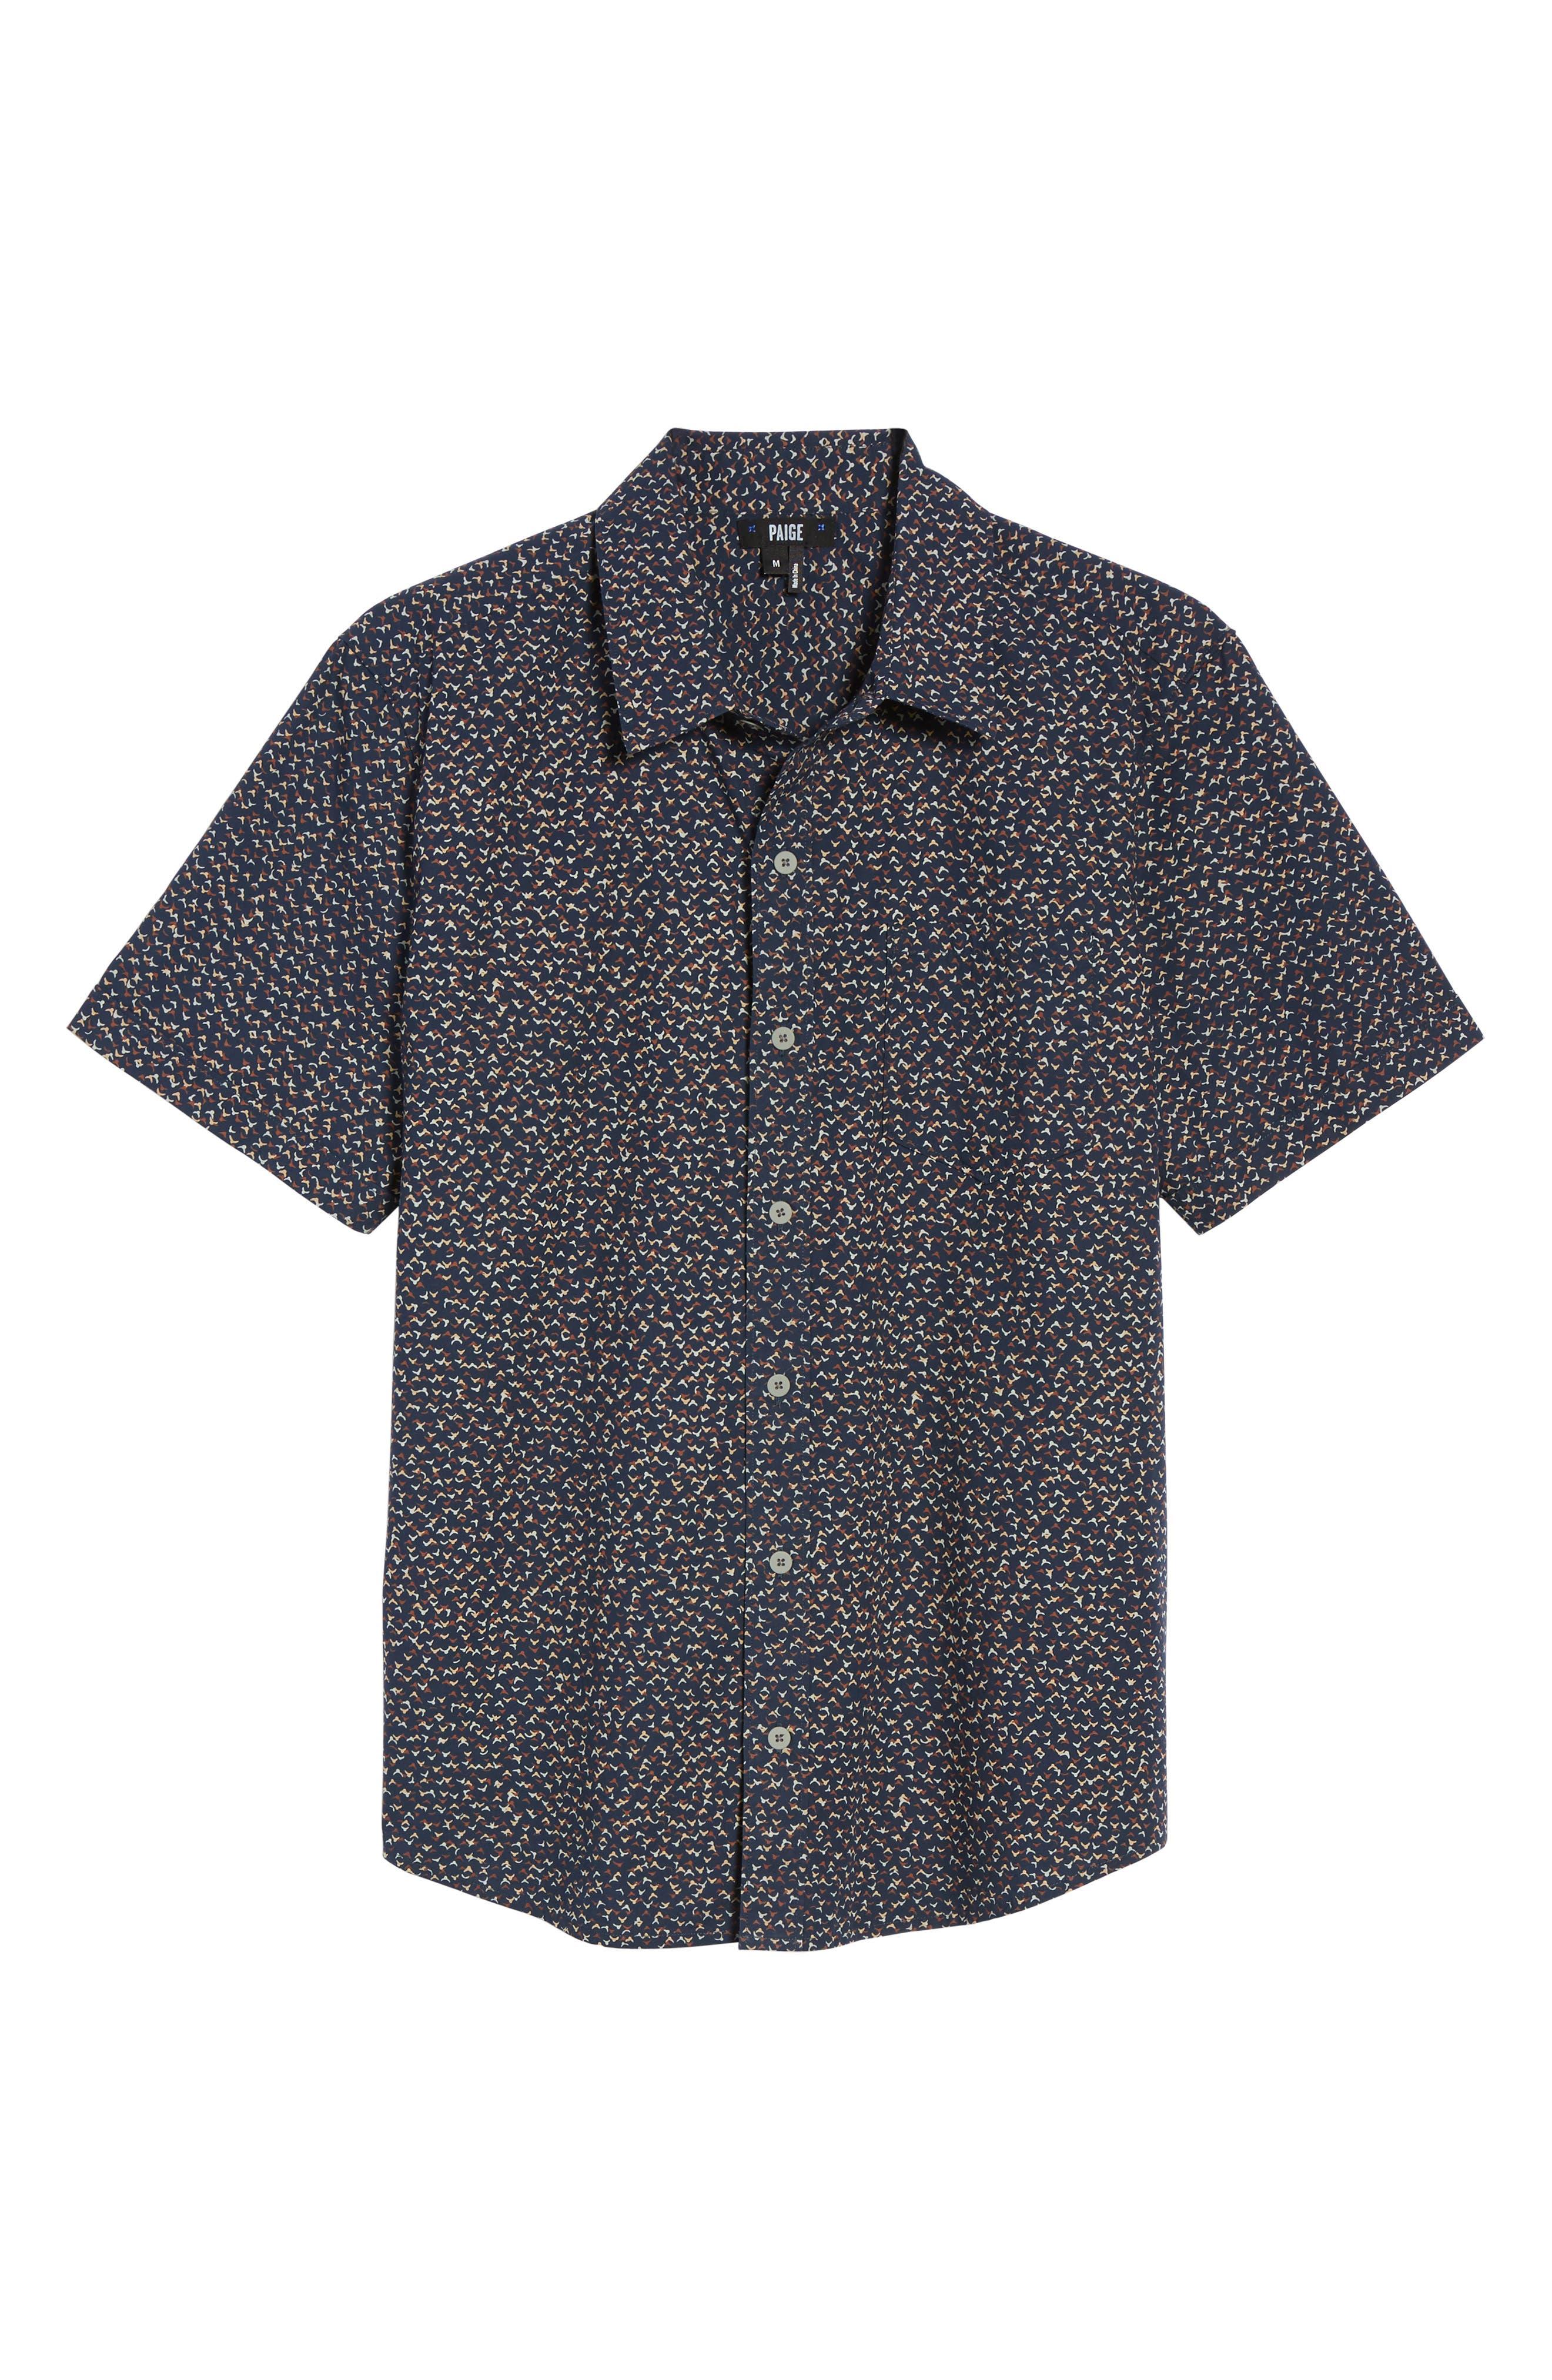 Alternate Image 5  - PAIGE Becker Patterned Woven Shirt